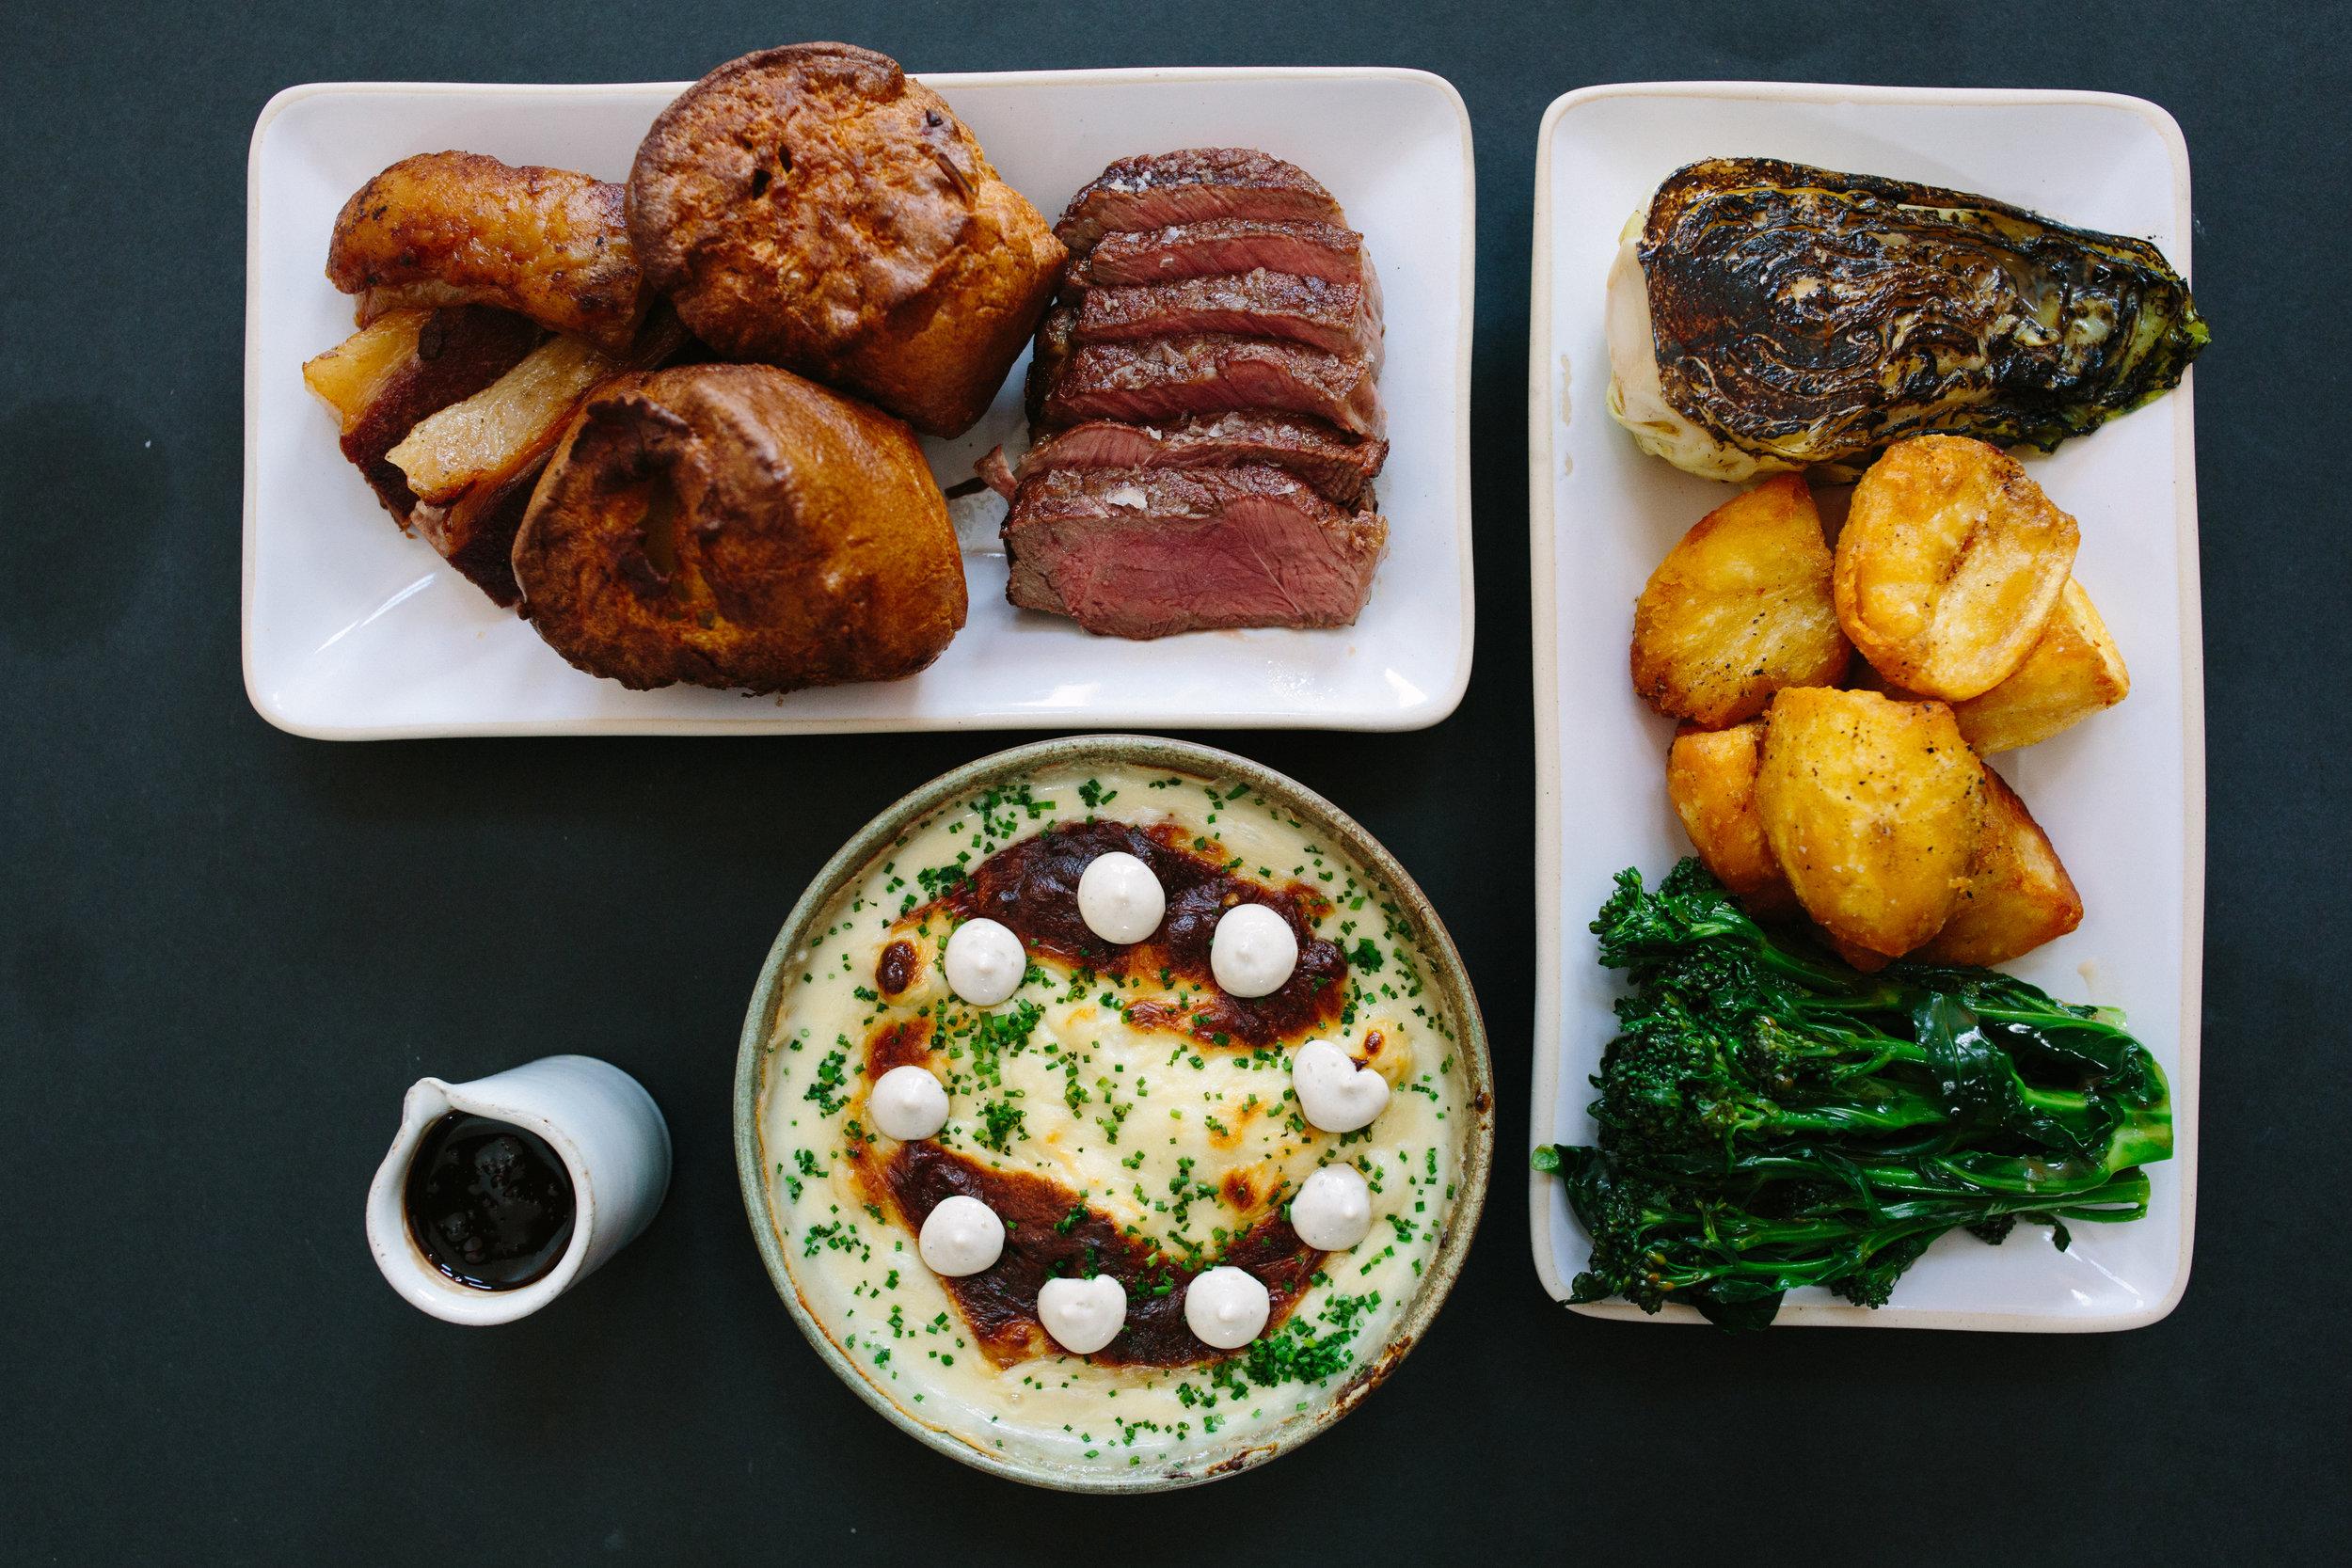 Sunday Roast - 60 day aged Sirloin and slow braised brisket for 2, roast potatoes, truffle cauliflower cheese, chargrilled hispi cabbage, roast carrots, Yorkshire puddings, beef gravy, smoked bone marrow and horseradish cream£25pp (minimum 2 people)